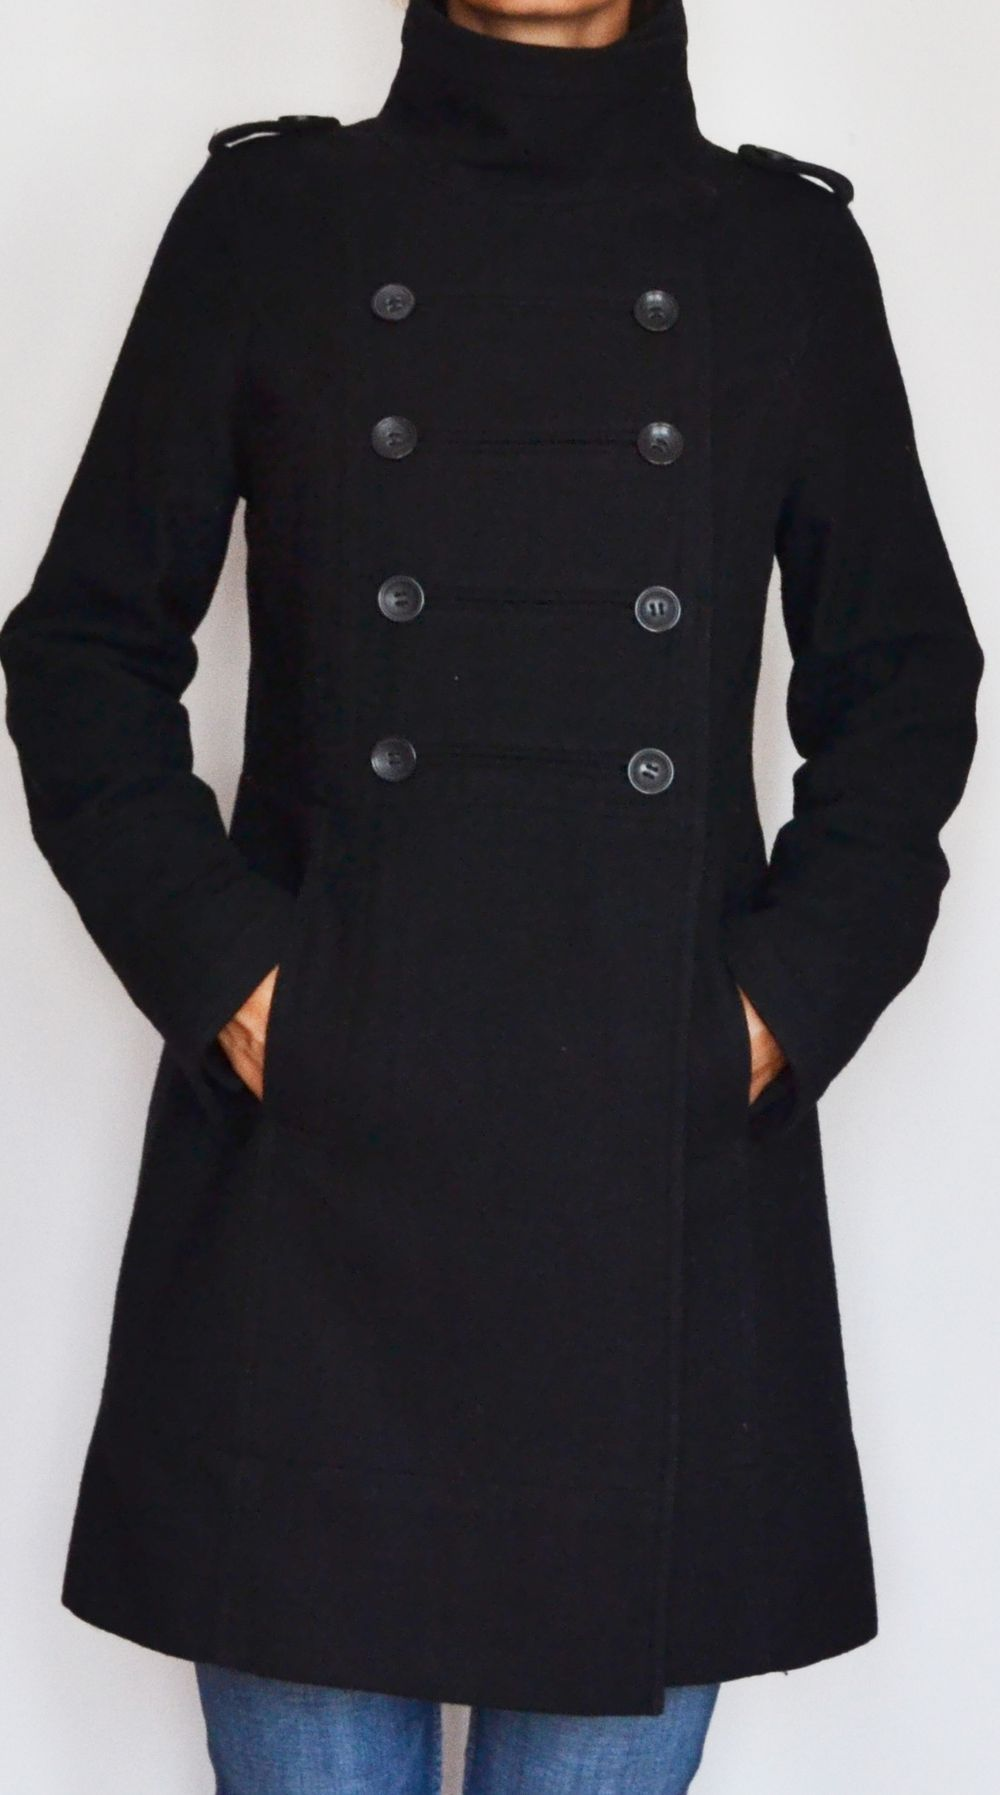 Manteau noir col officier via L vide son dressing. Click on the image to see more!